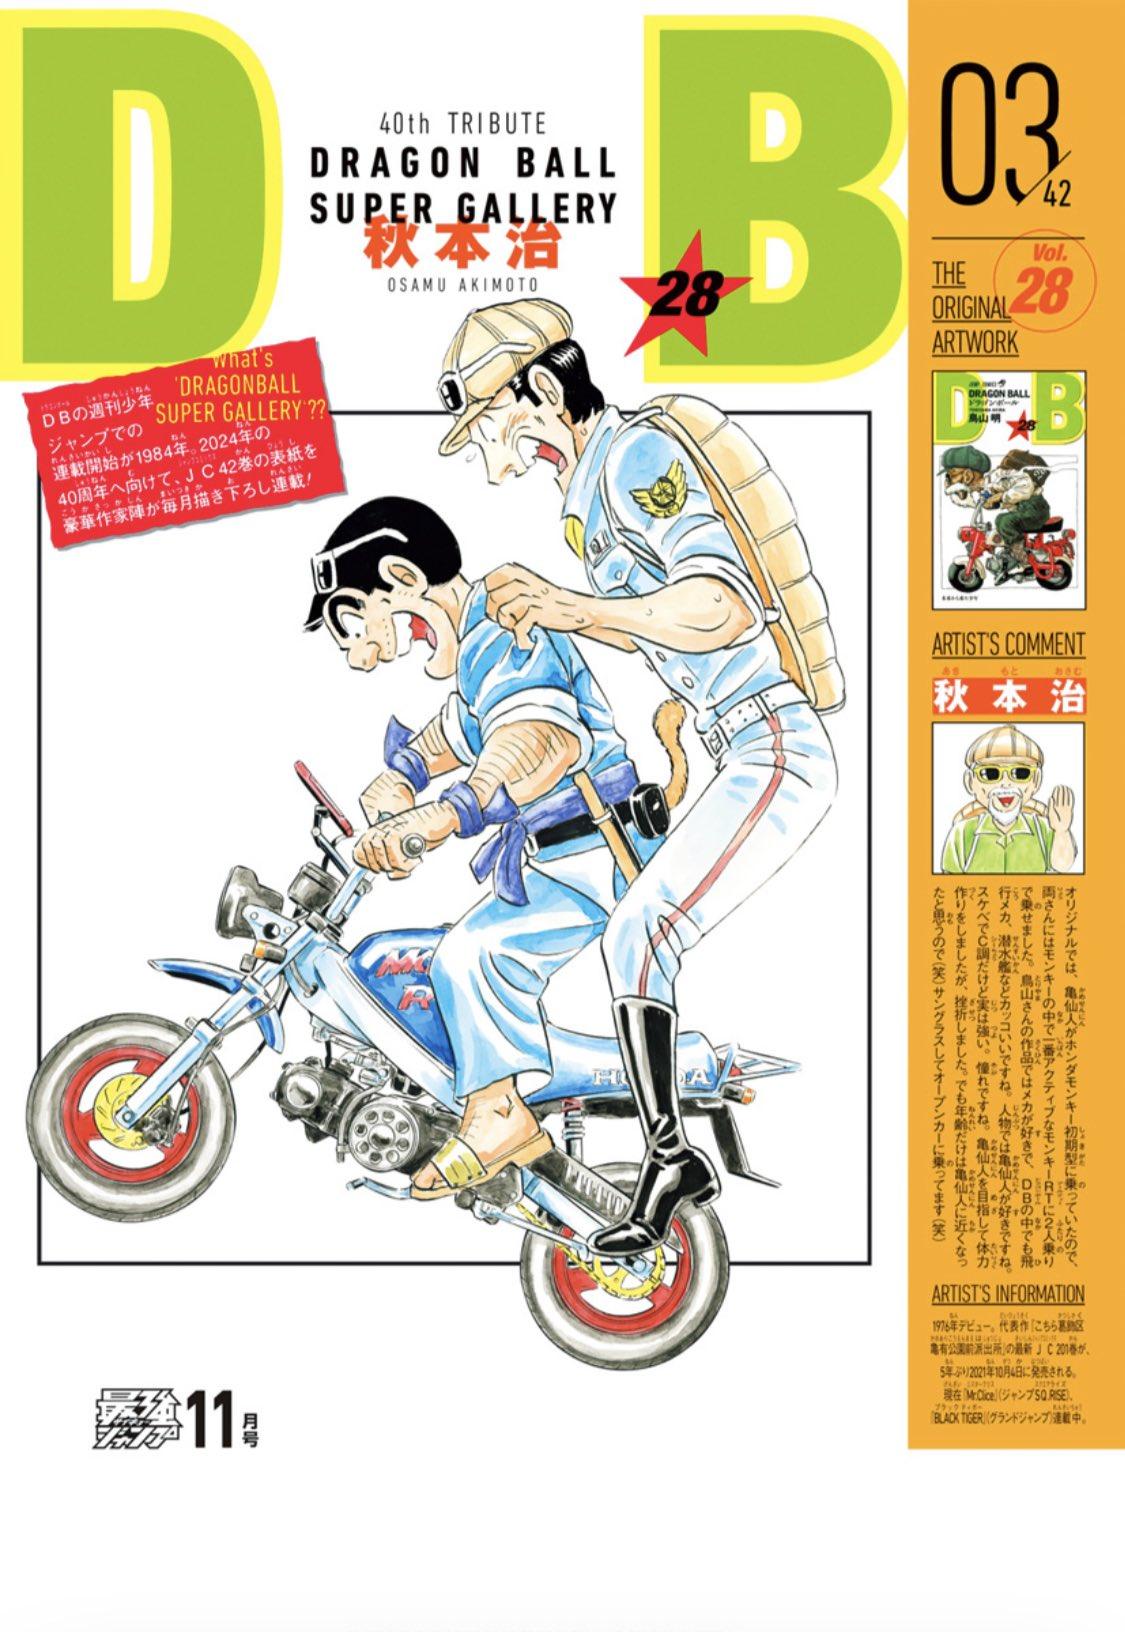 dragon ball osamu akimoto